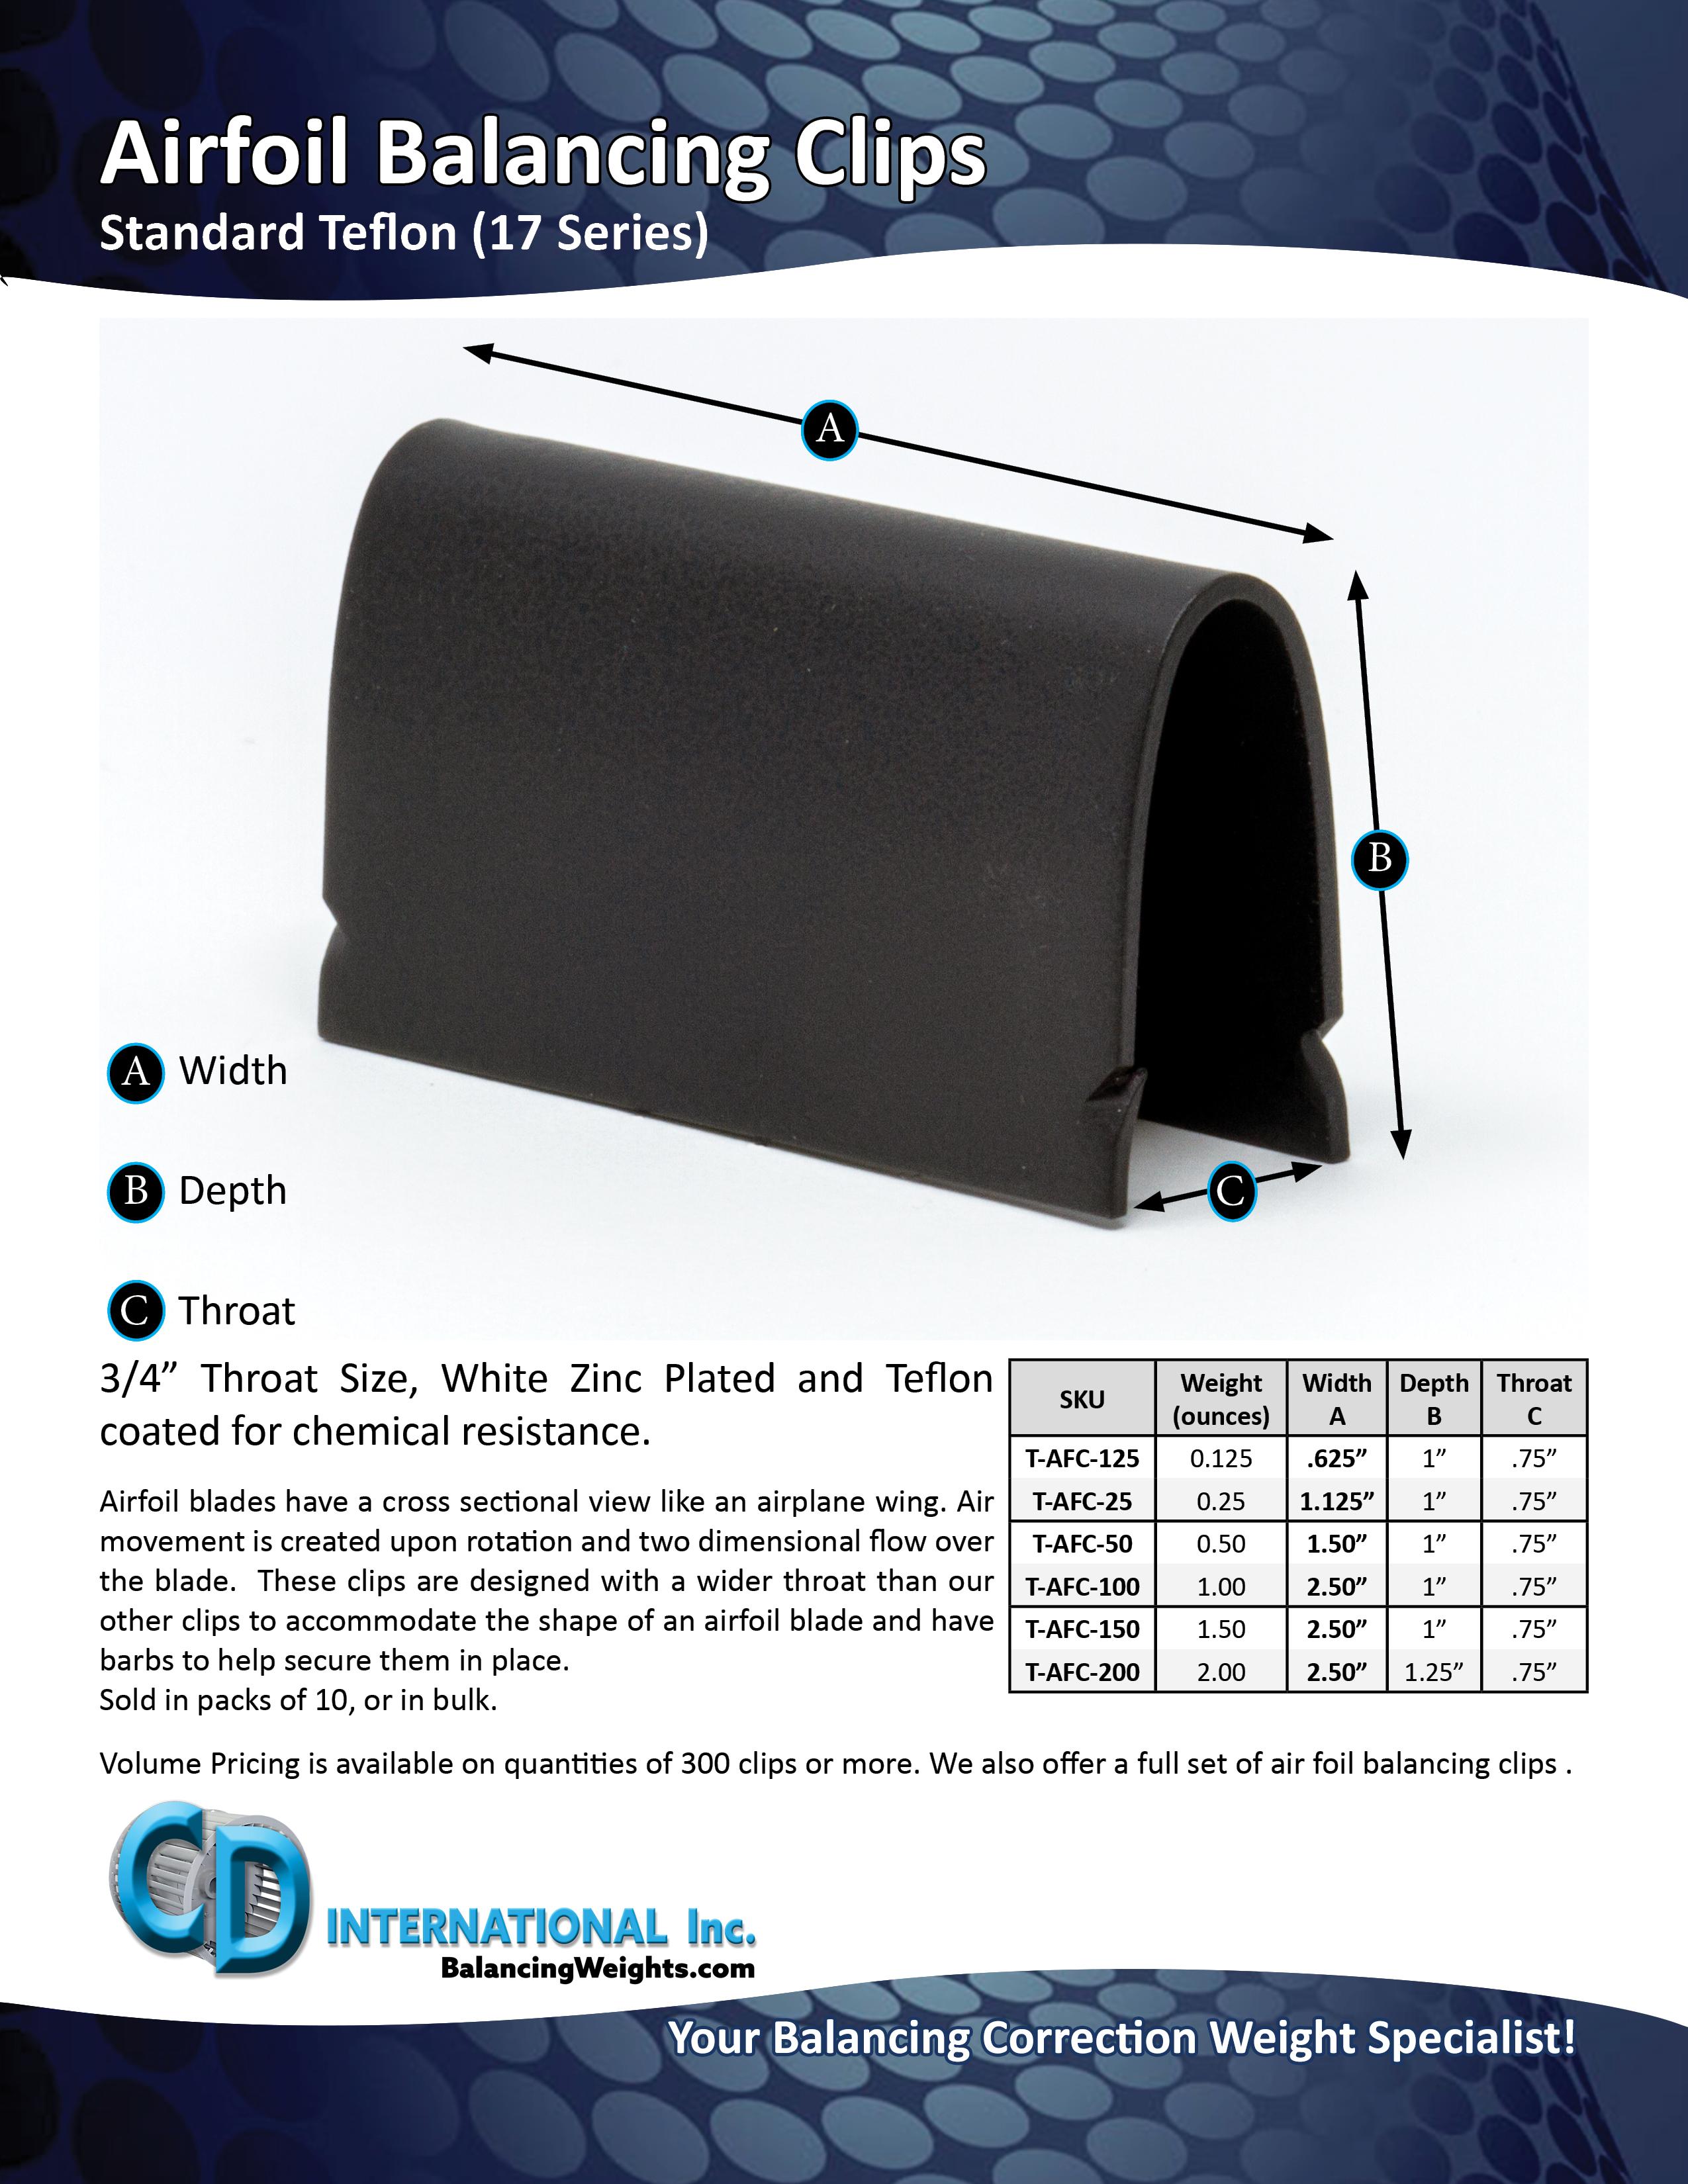 standard-teflon-afc-spec-sheets.jpg